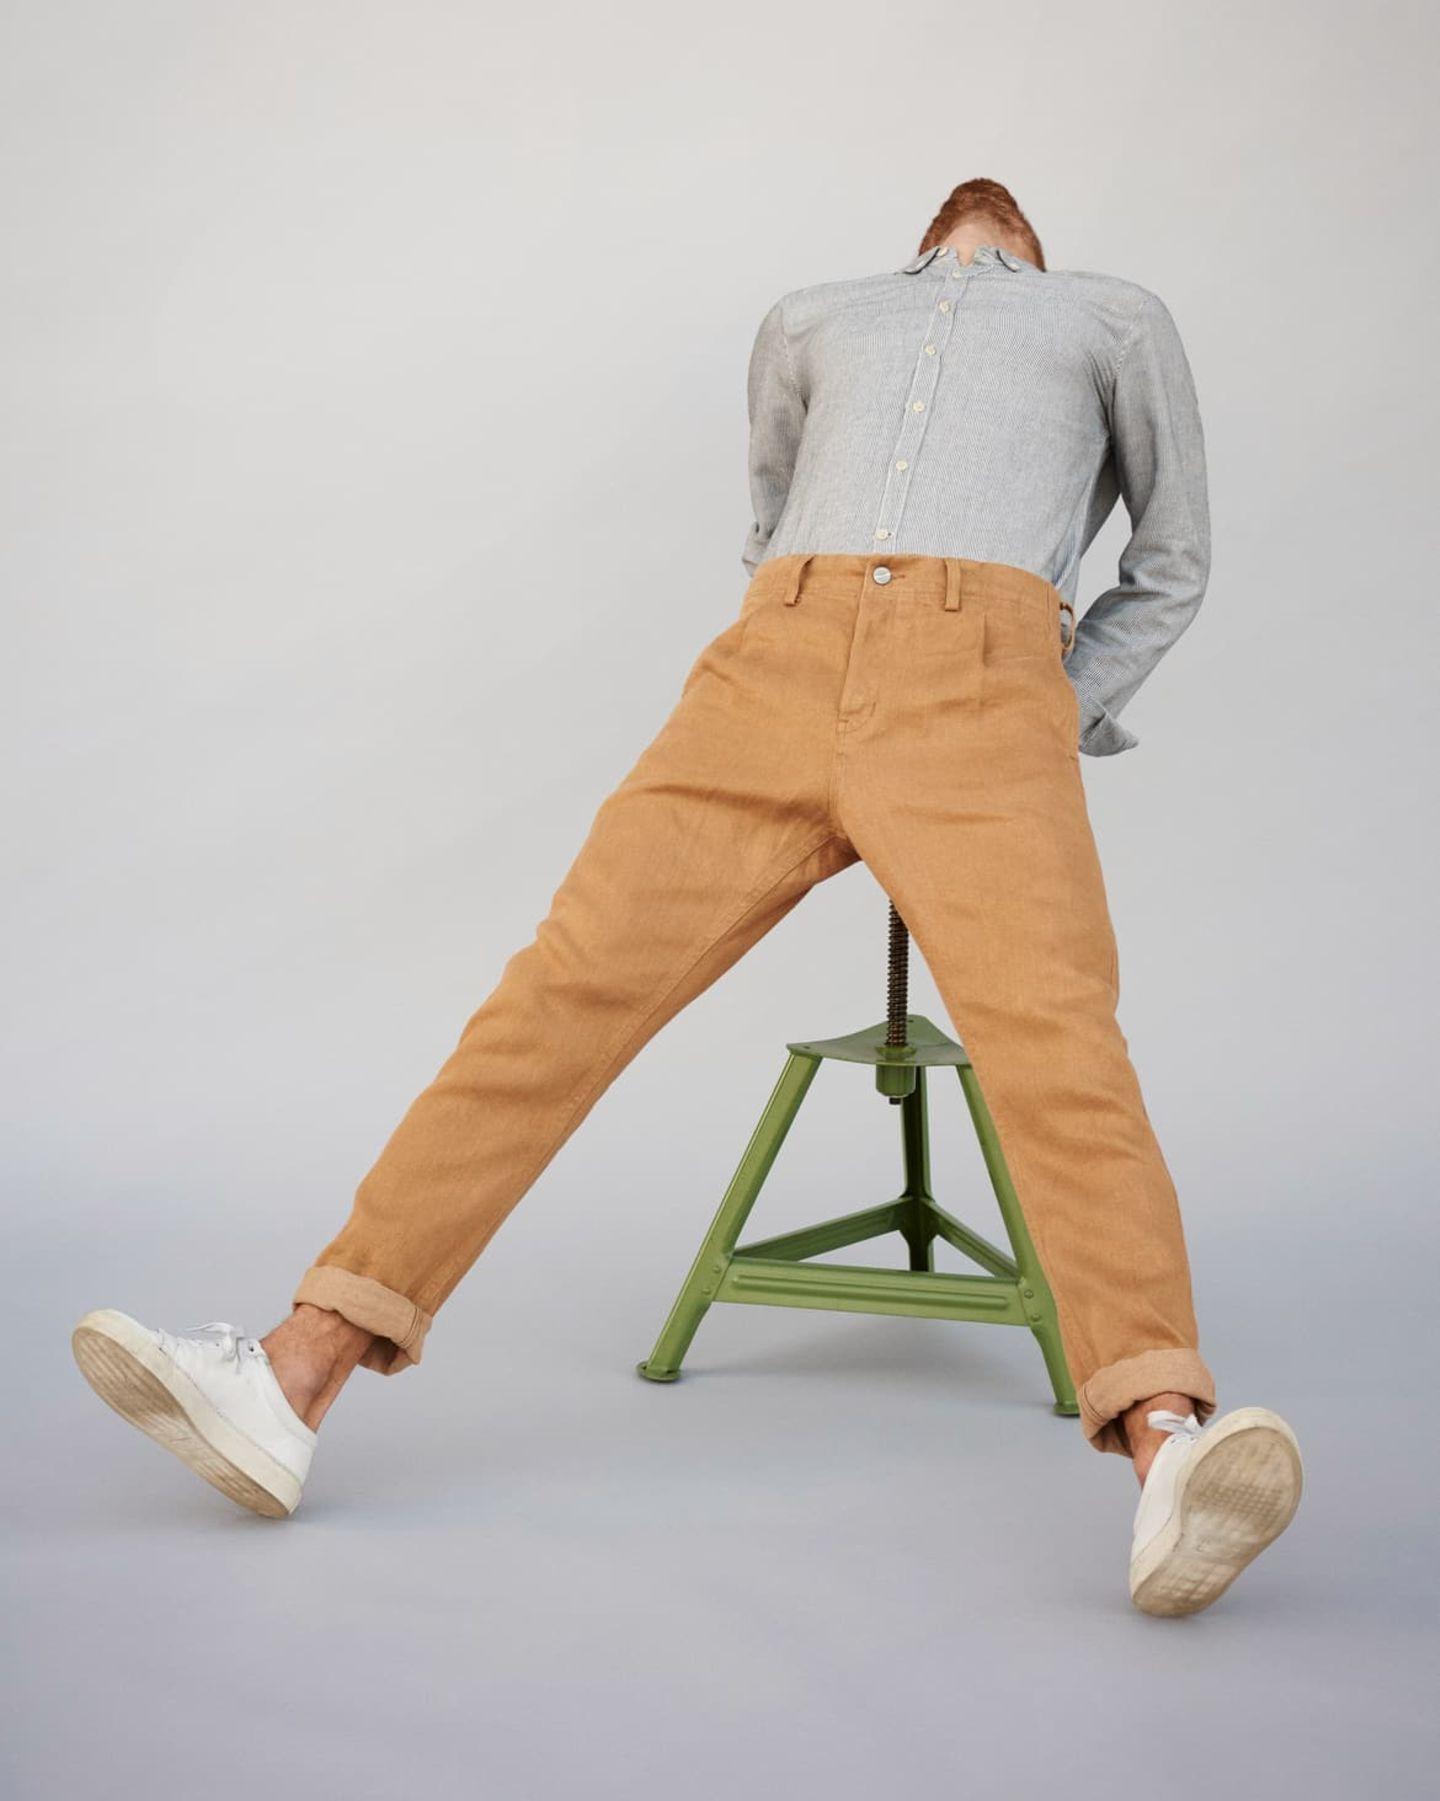 Nachhaltig produzierte Hose von FREITAG